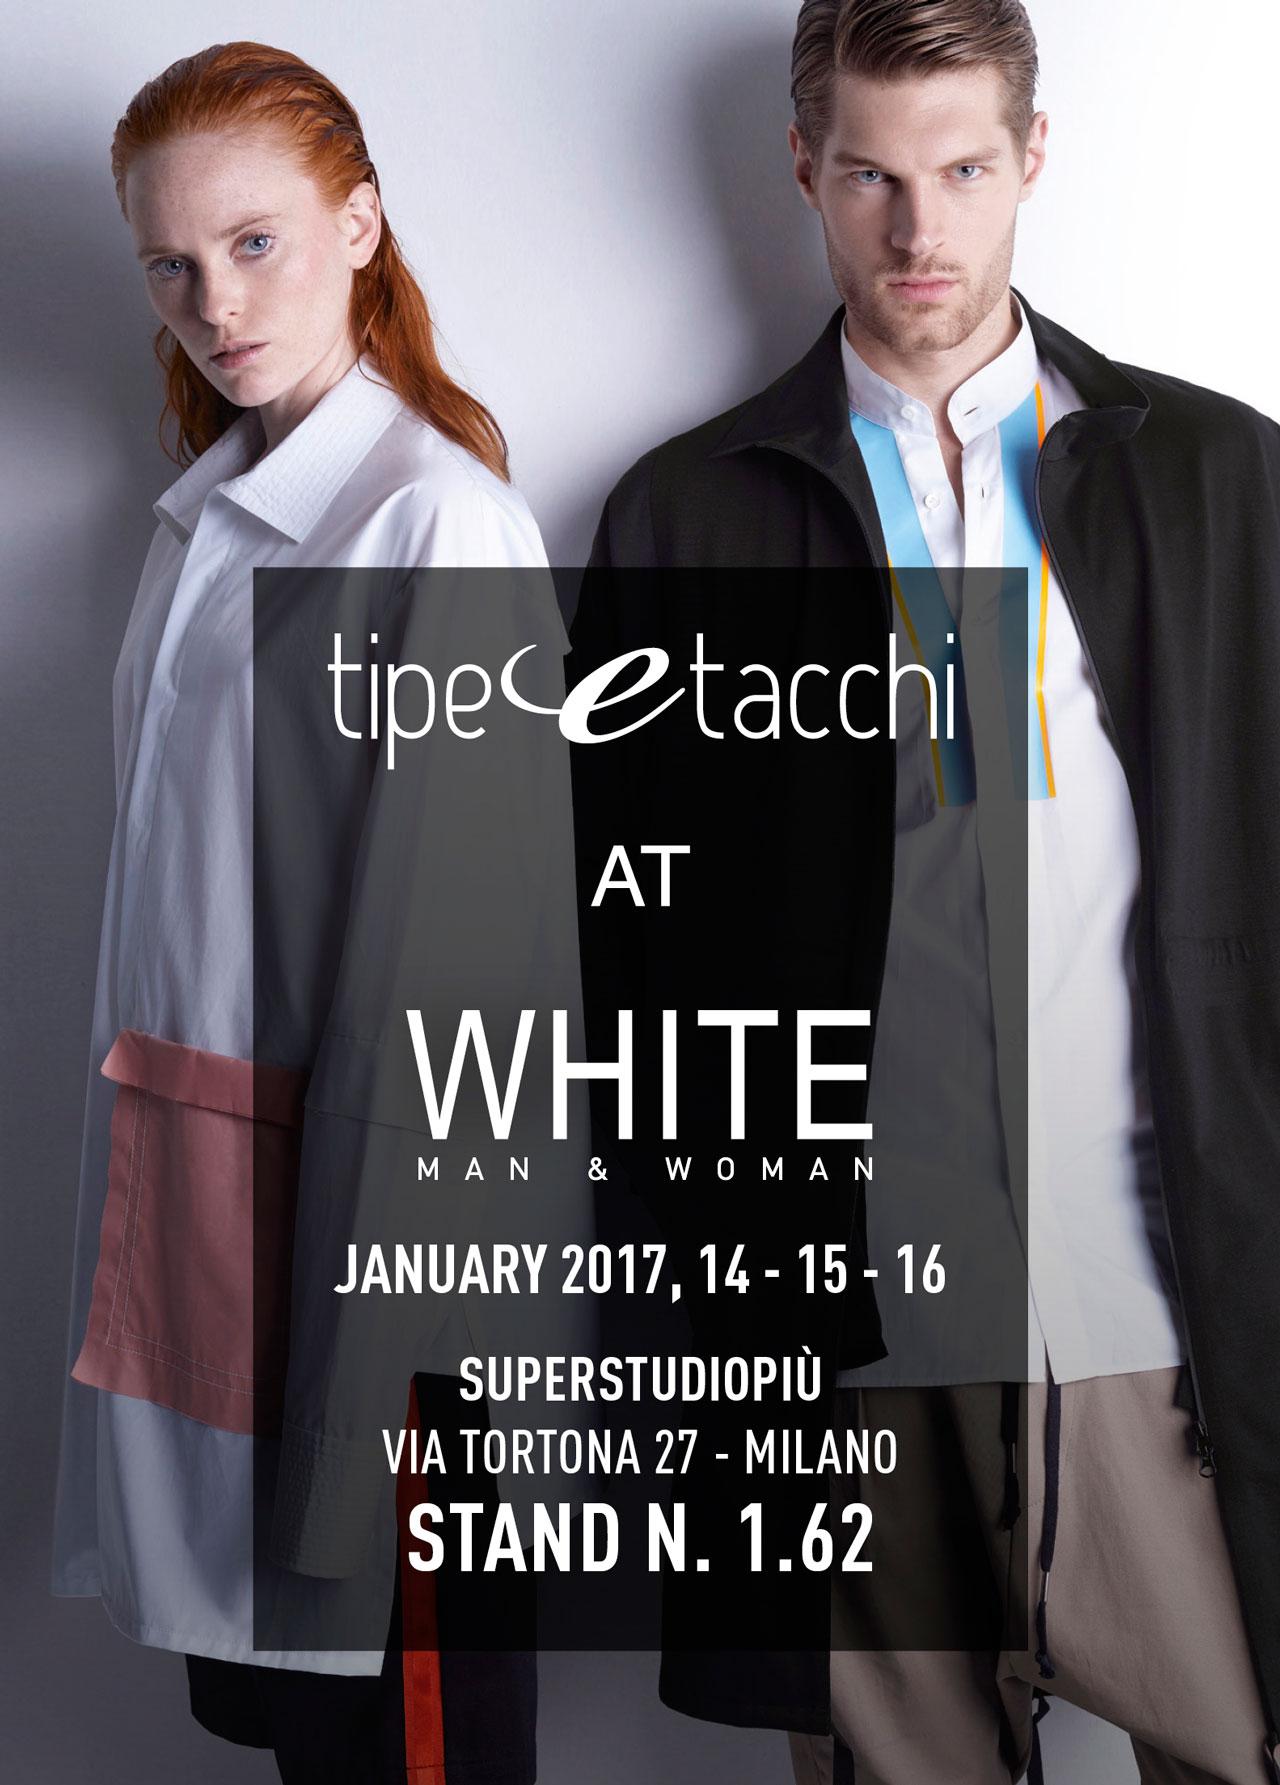 TipeeTacchi at White Man & Woman-January 2017